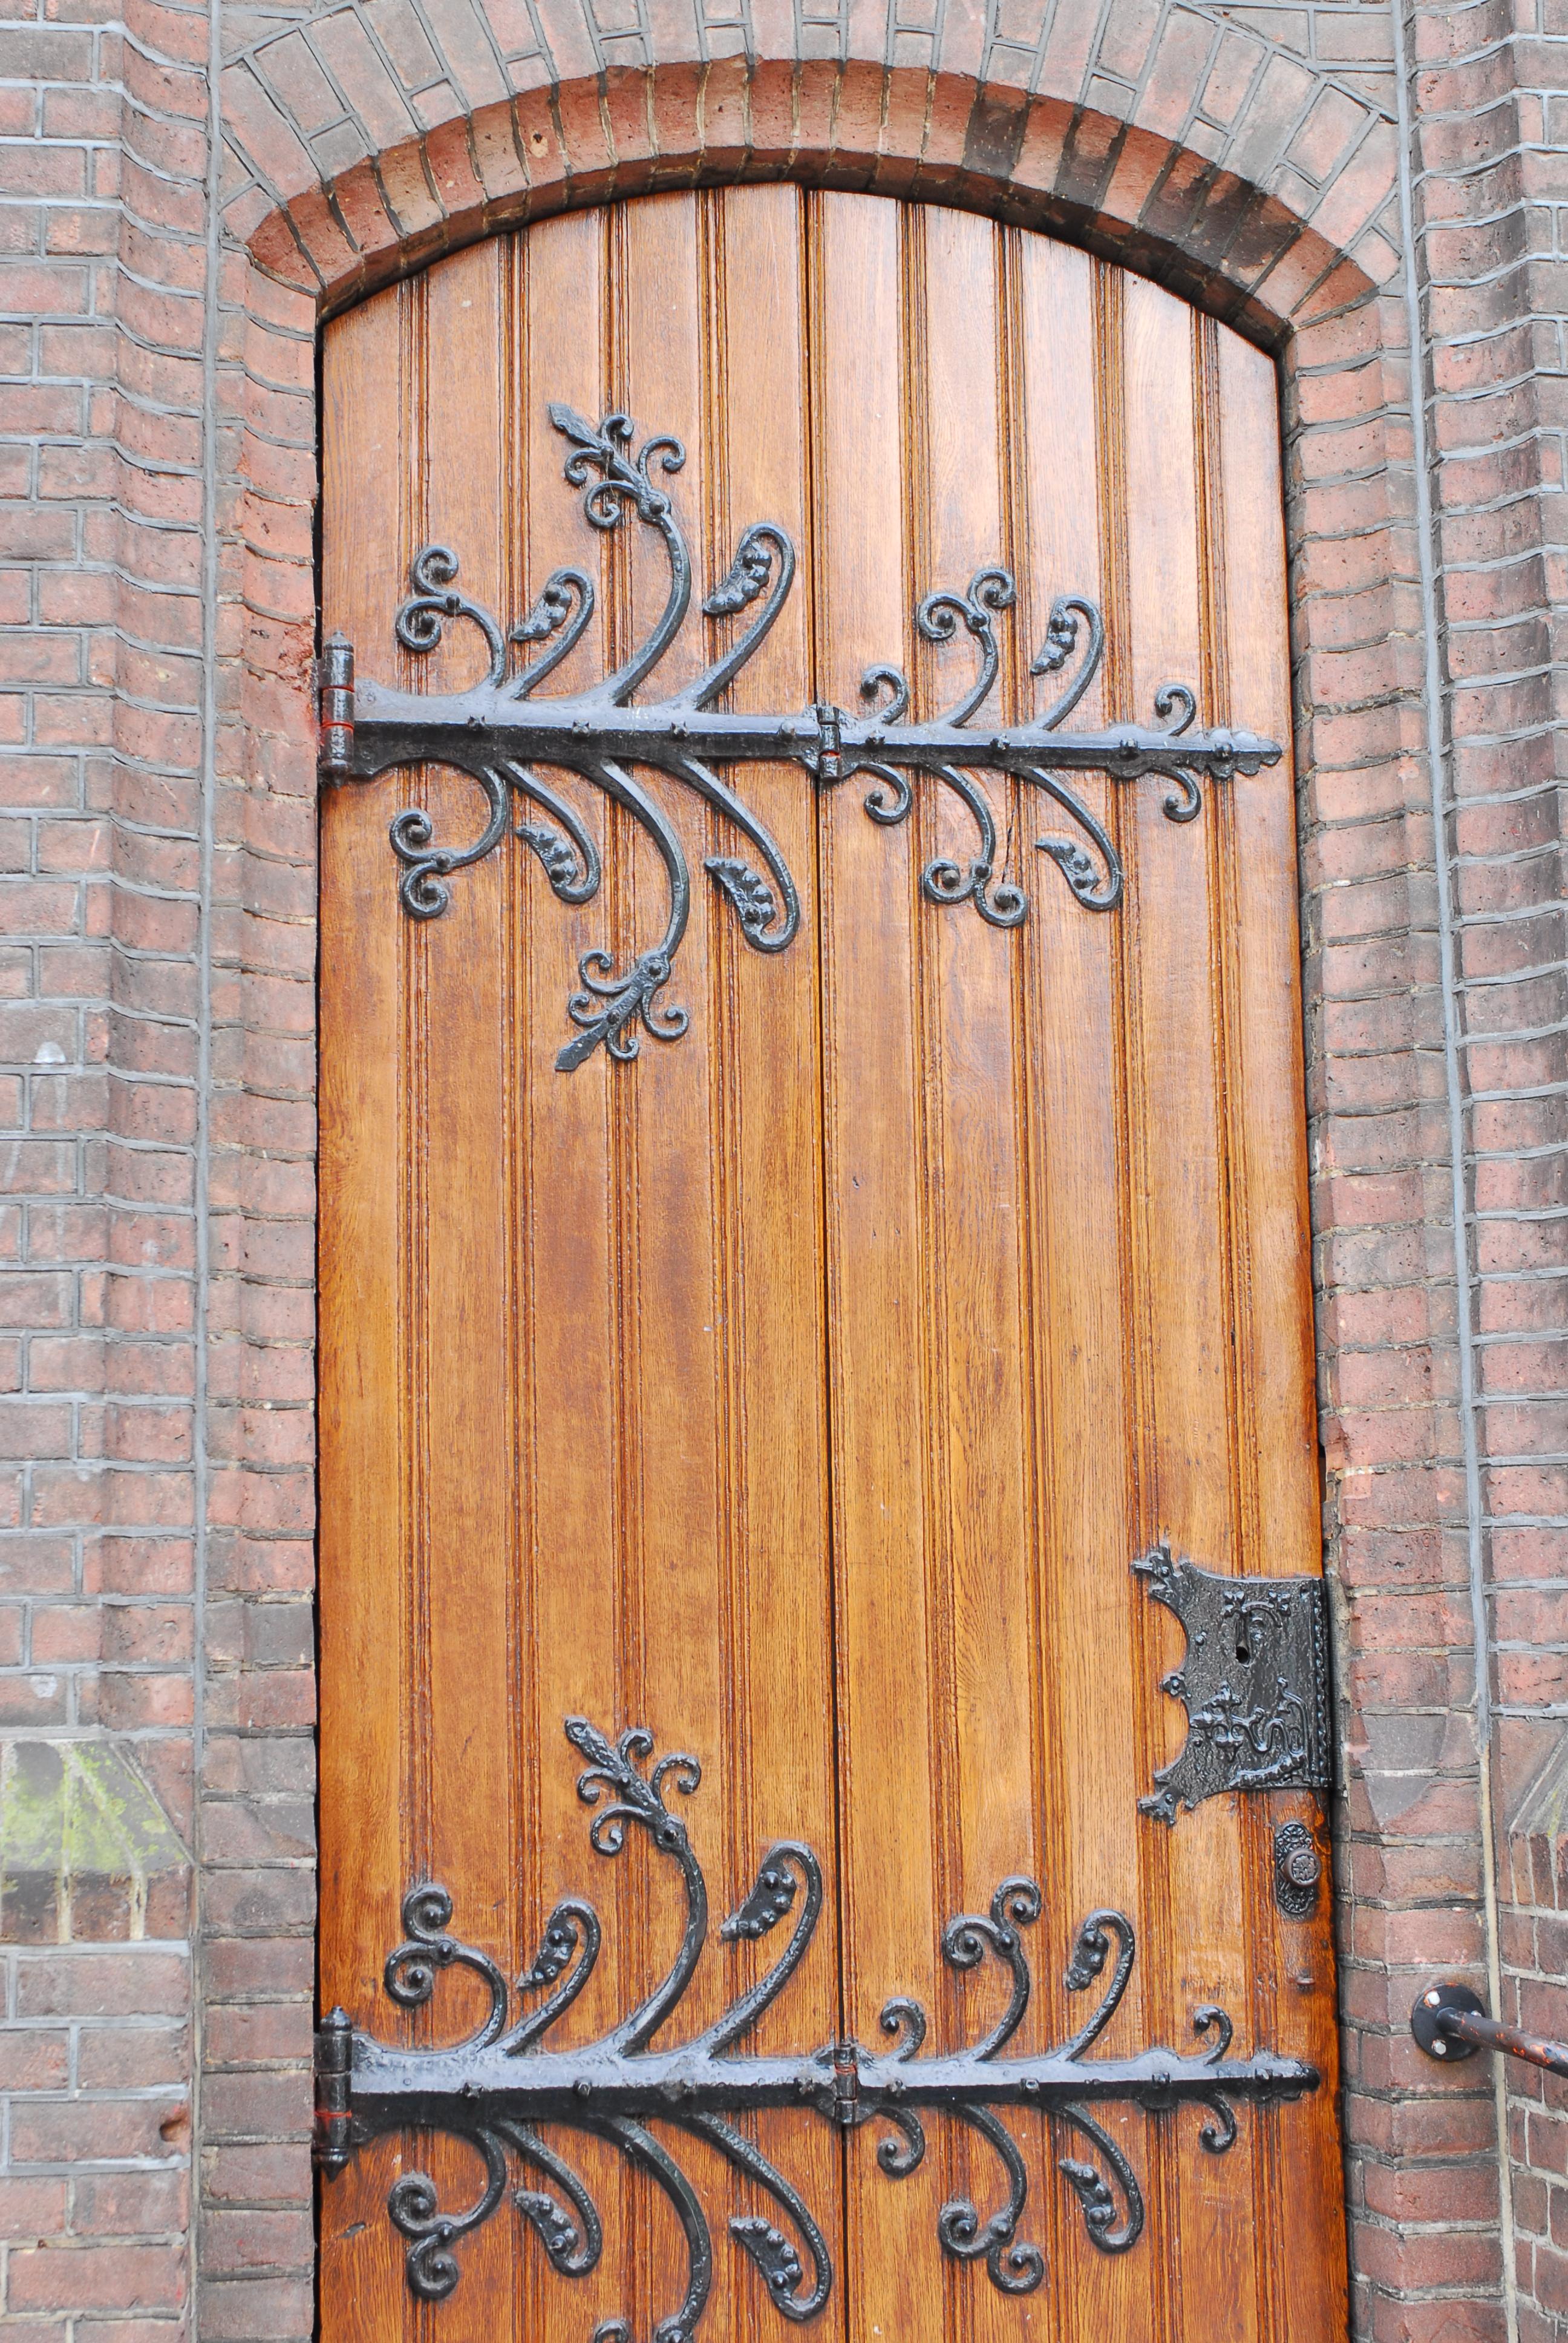 European door musings of tonya latorre for European entry doors